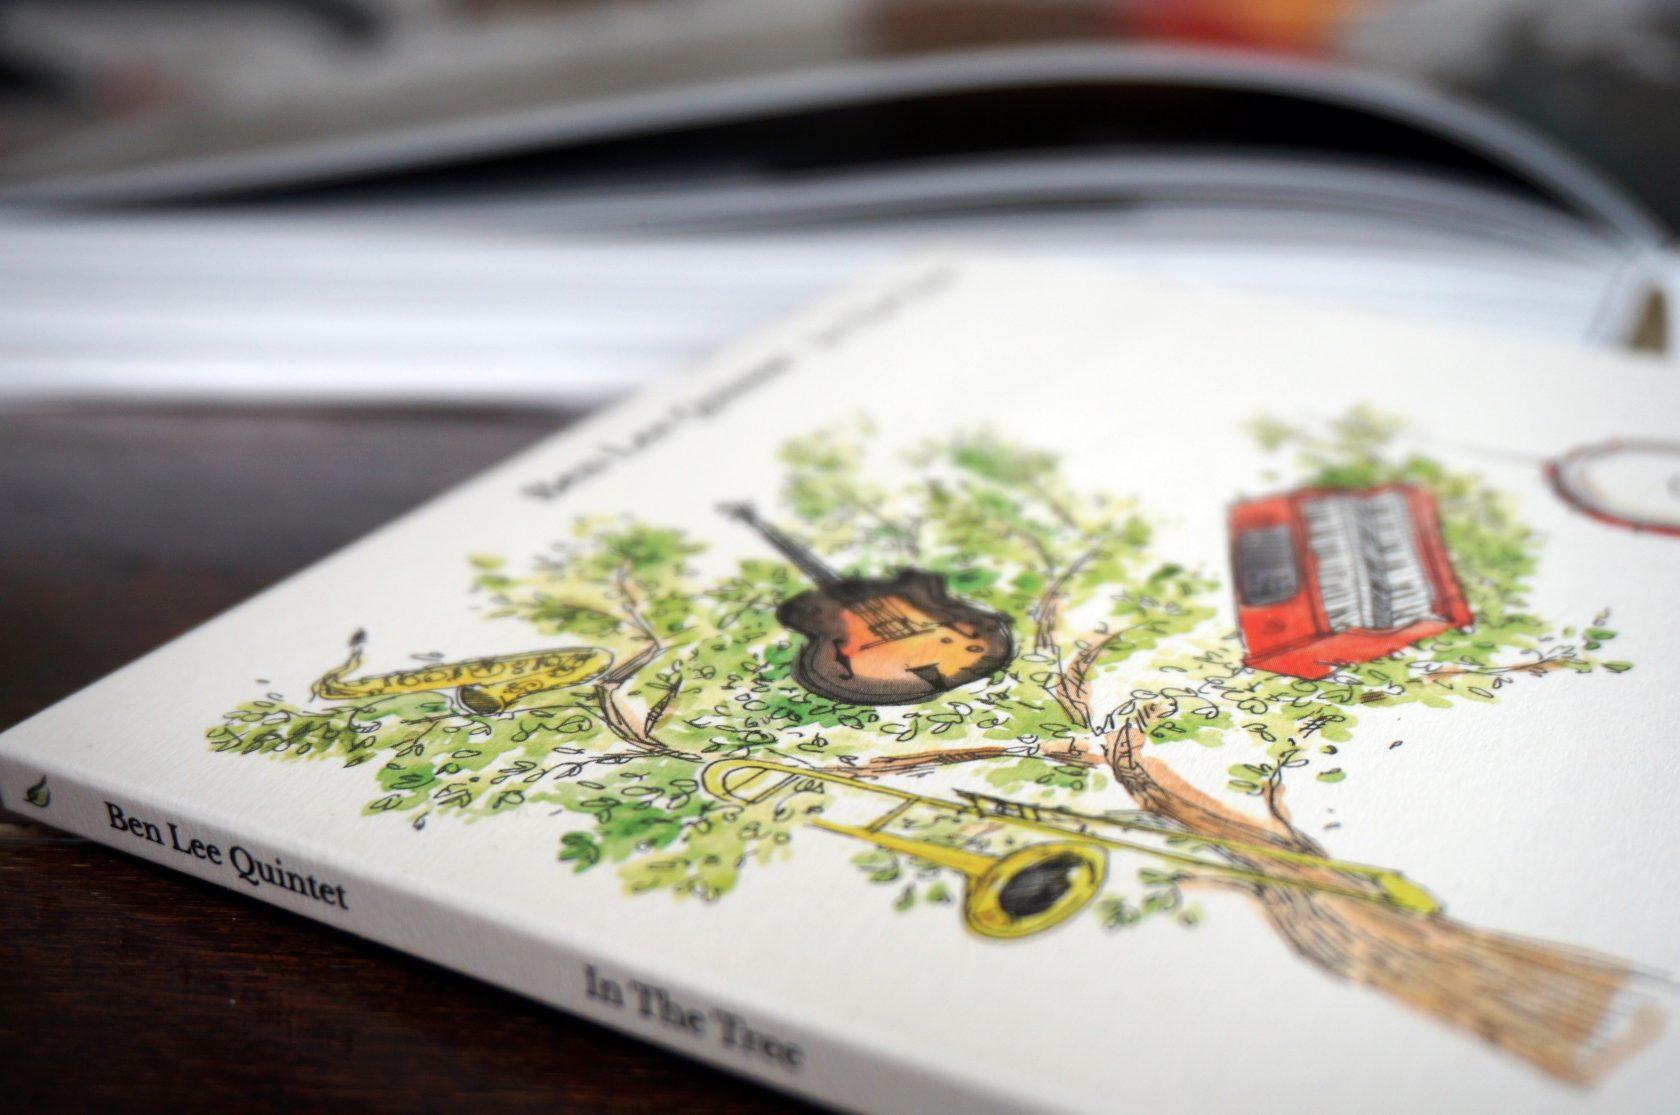 Ben Lee - In The Tree - packshot